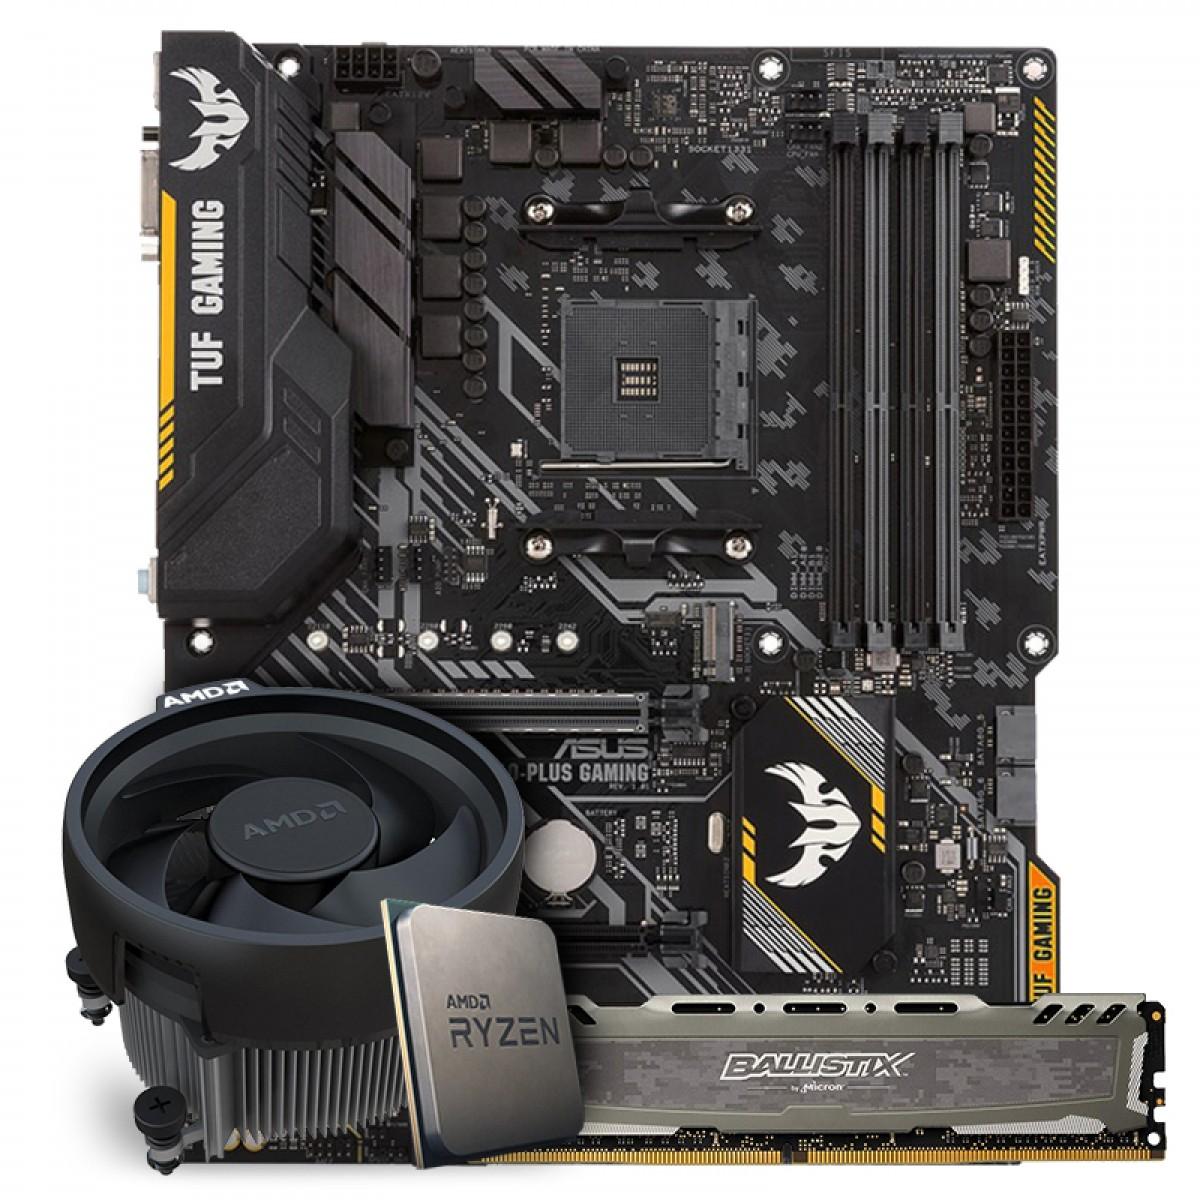 Kit Upgrade Placa Mãe Asus TUF B450-PLUS GAMING, AMD AM4 + Processador AMD Ryzen 5 3600 3.6GHz + Memória DDR4 16GB 2666MHz